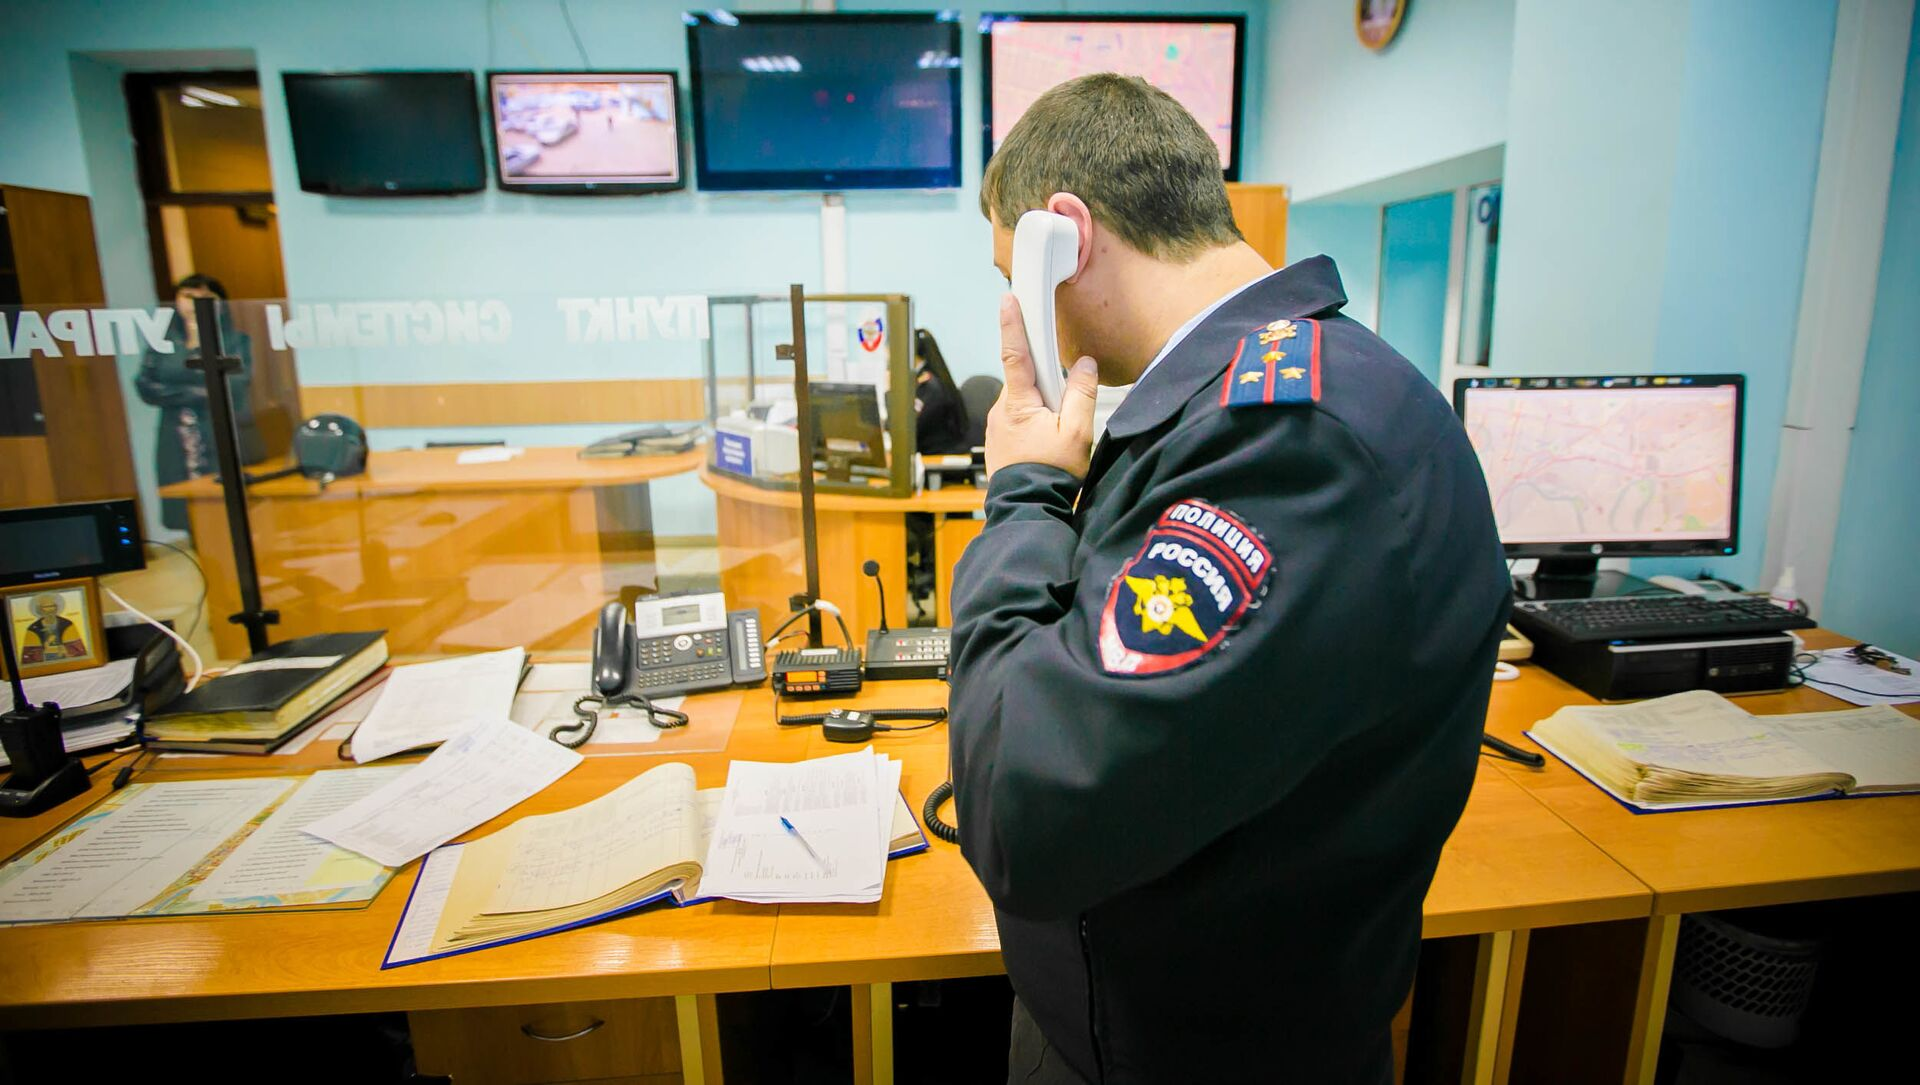 Polizia russa - Sputnik Italia, 1920, 17.05.2021